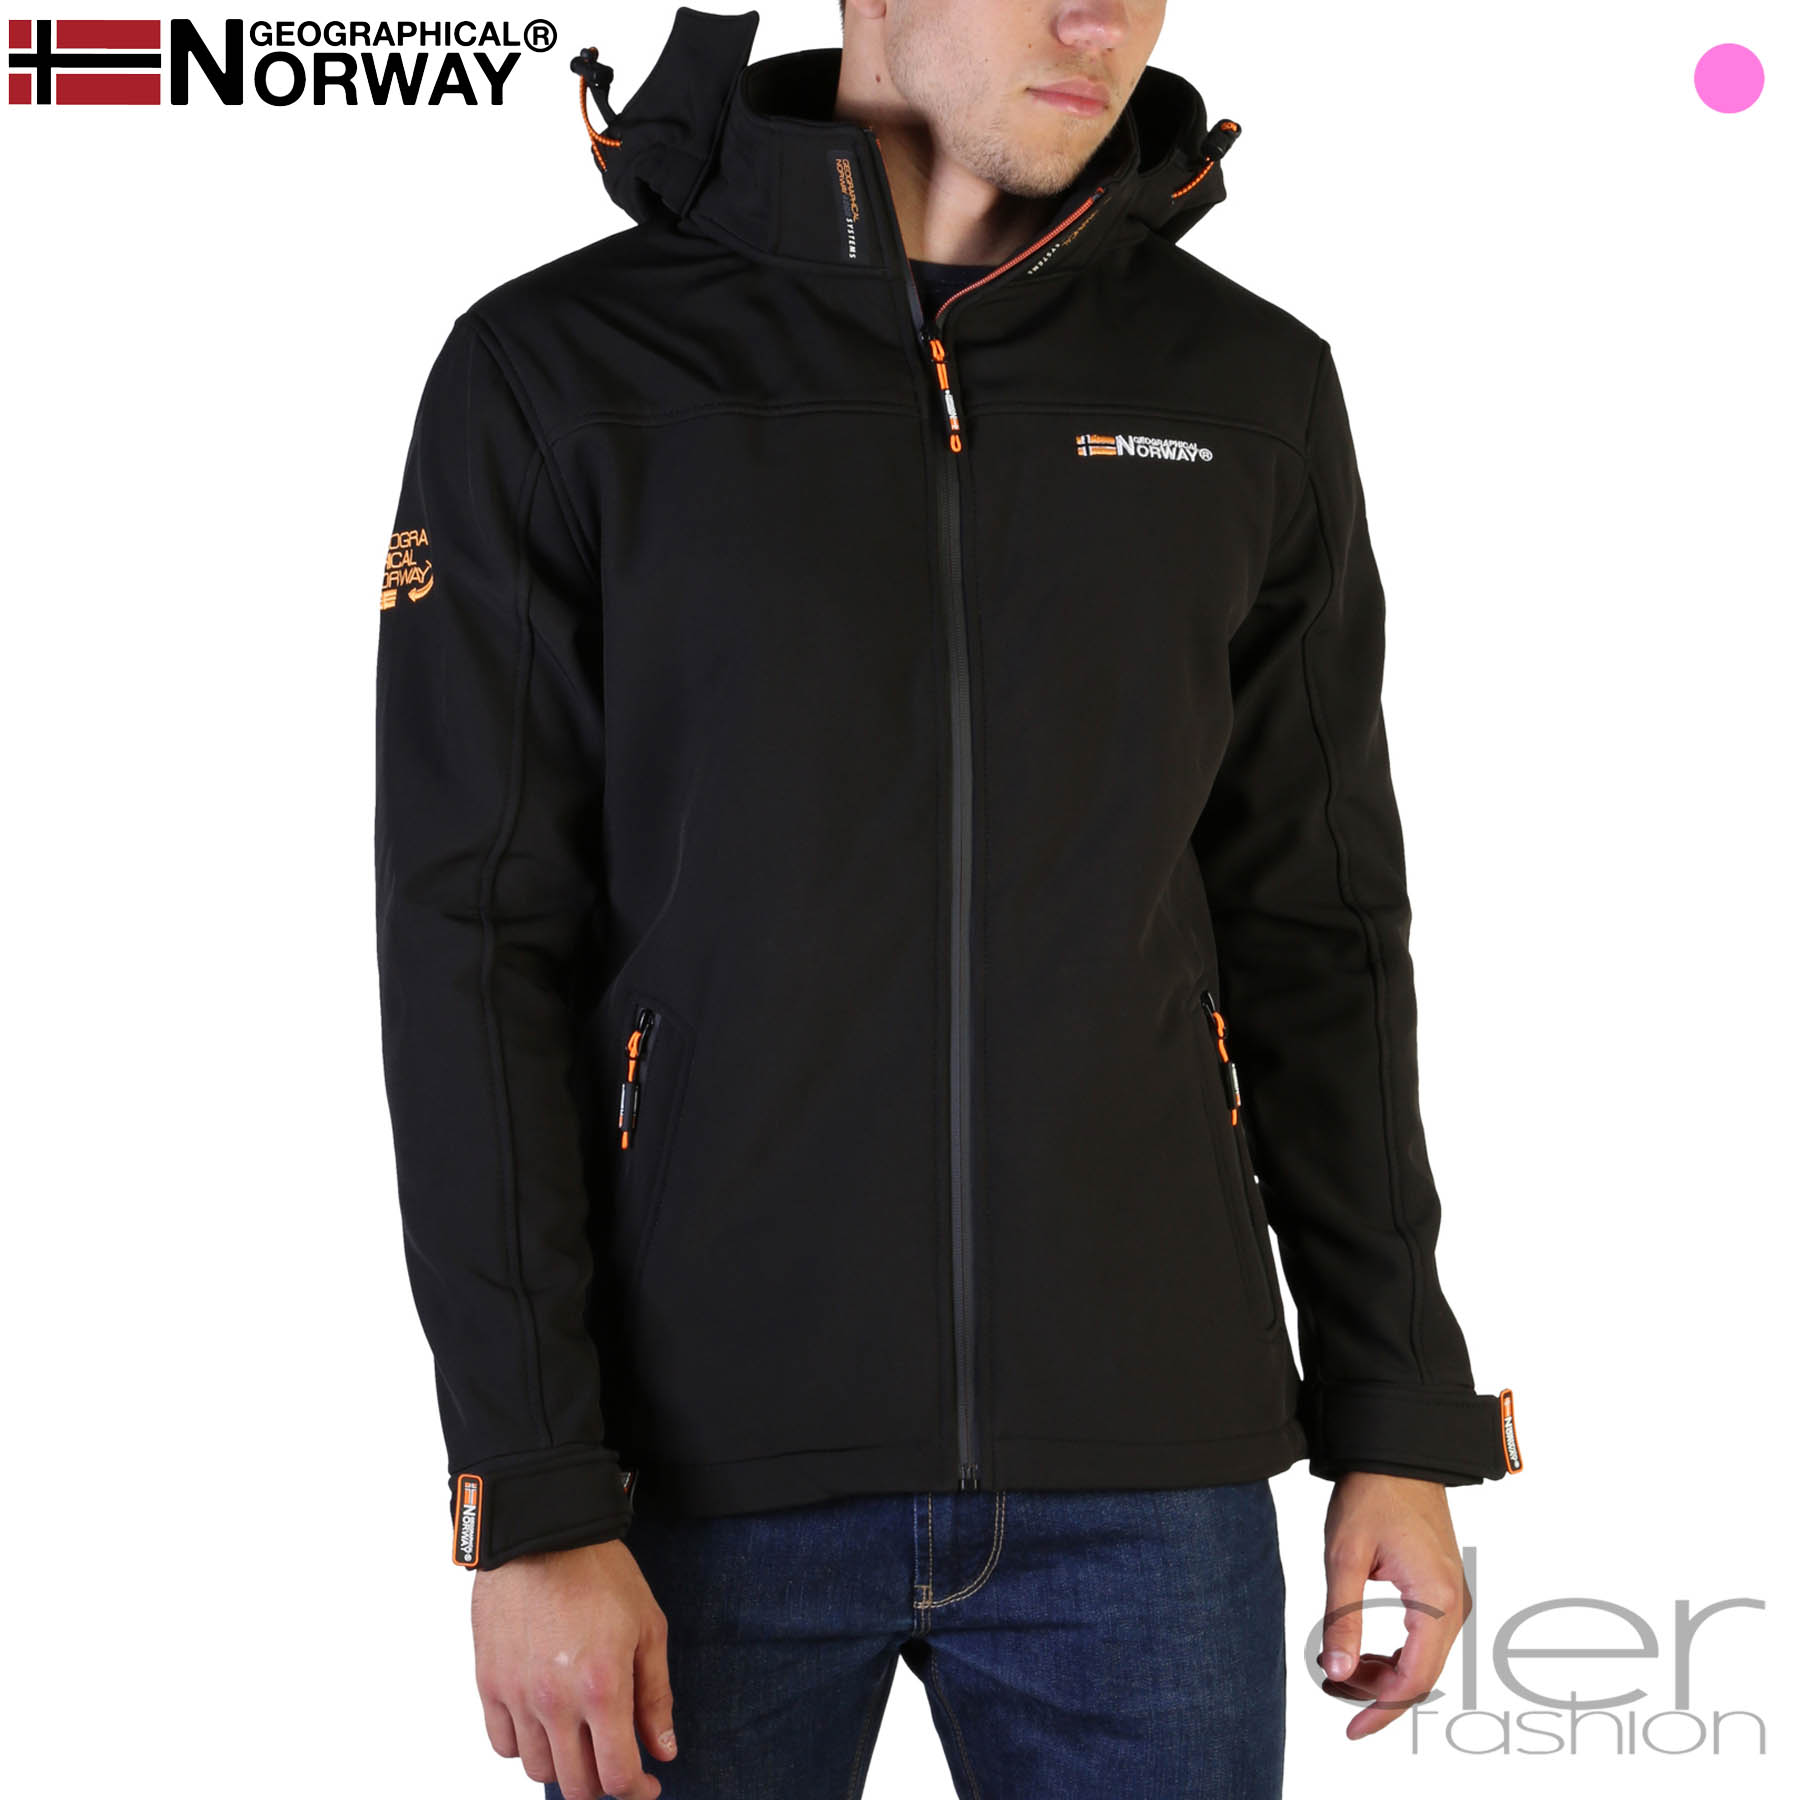 Vestes Geographical Norway Takeaway_man Homme Noir 102565